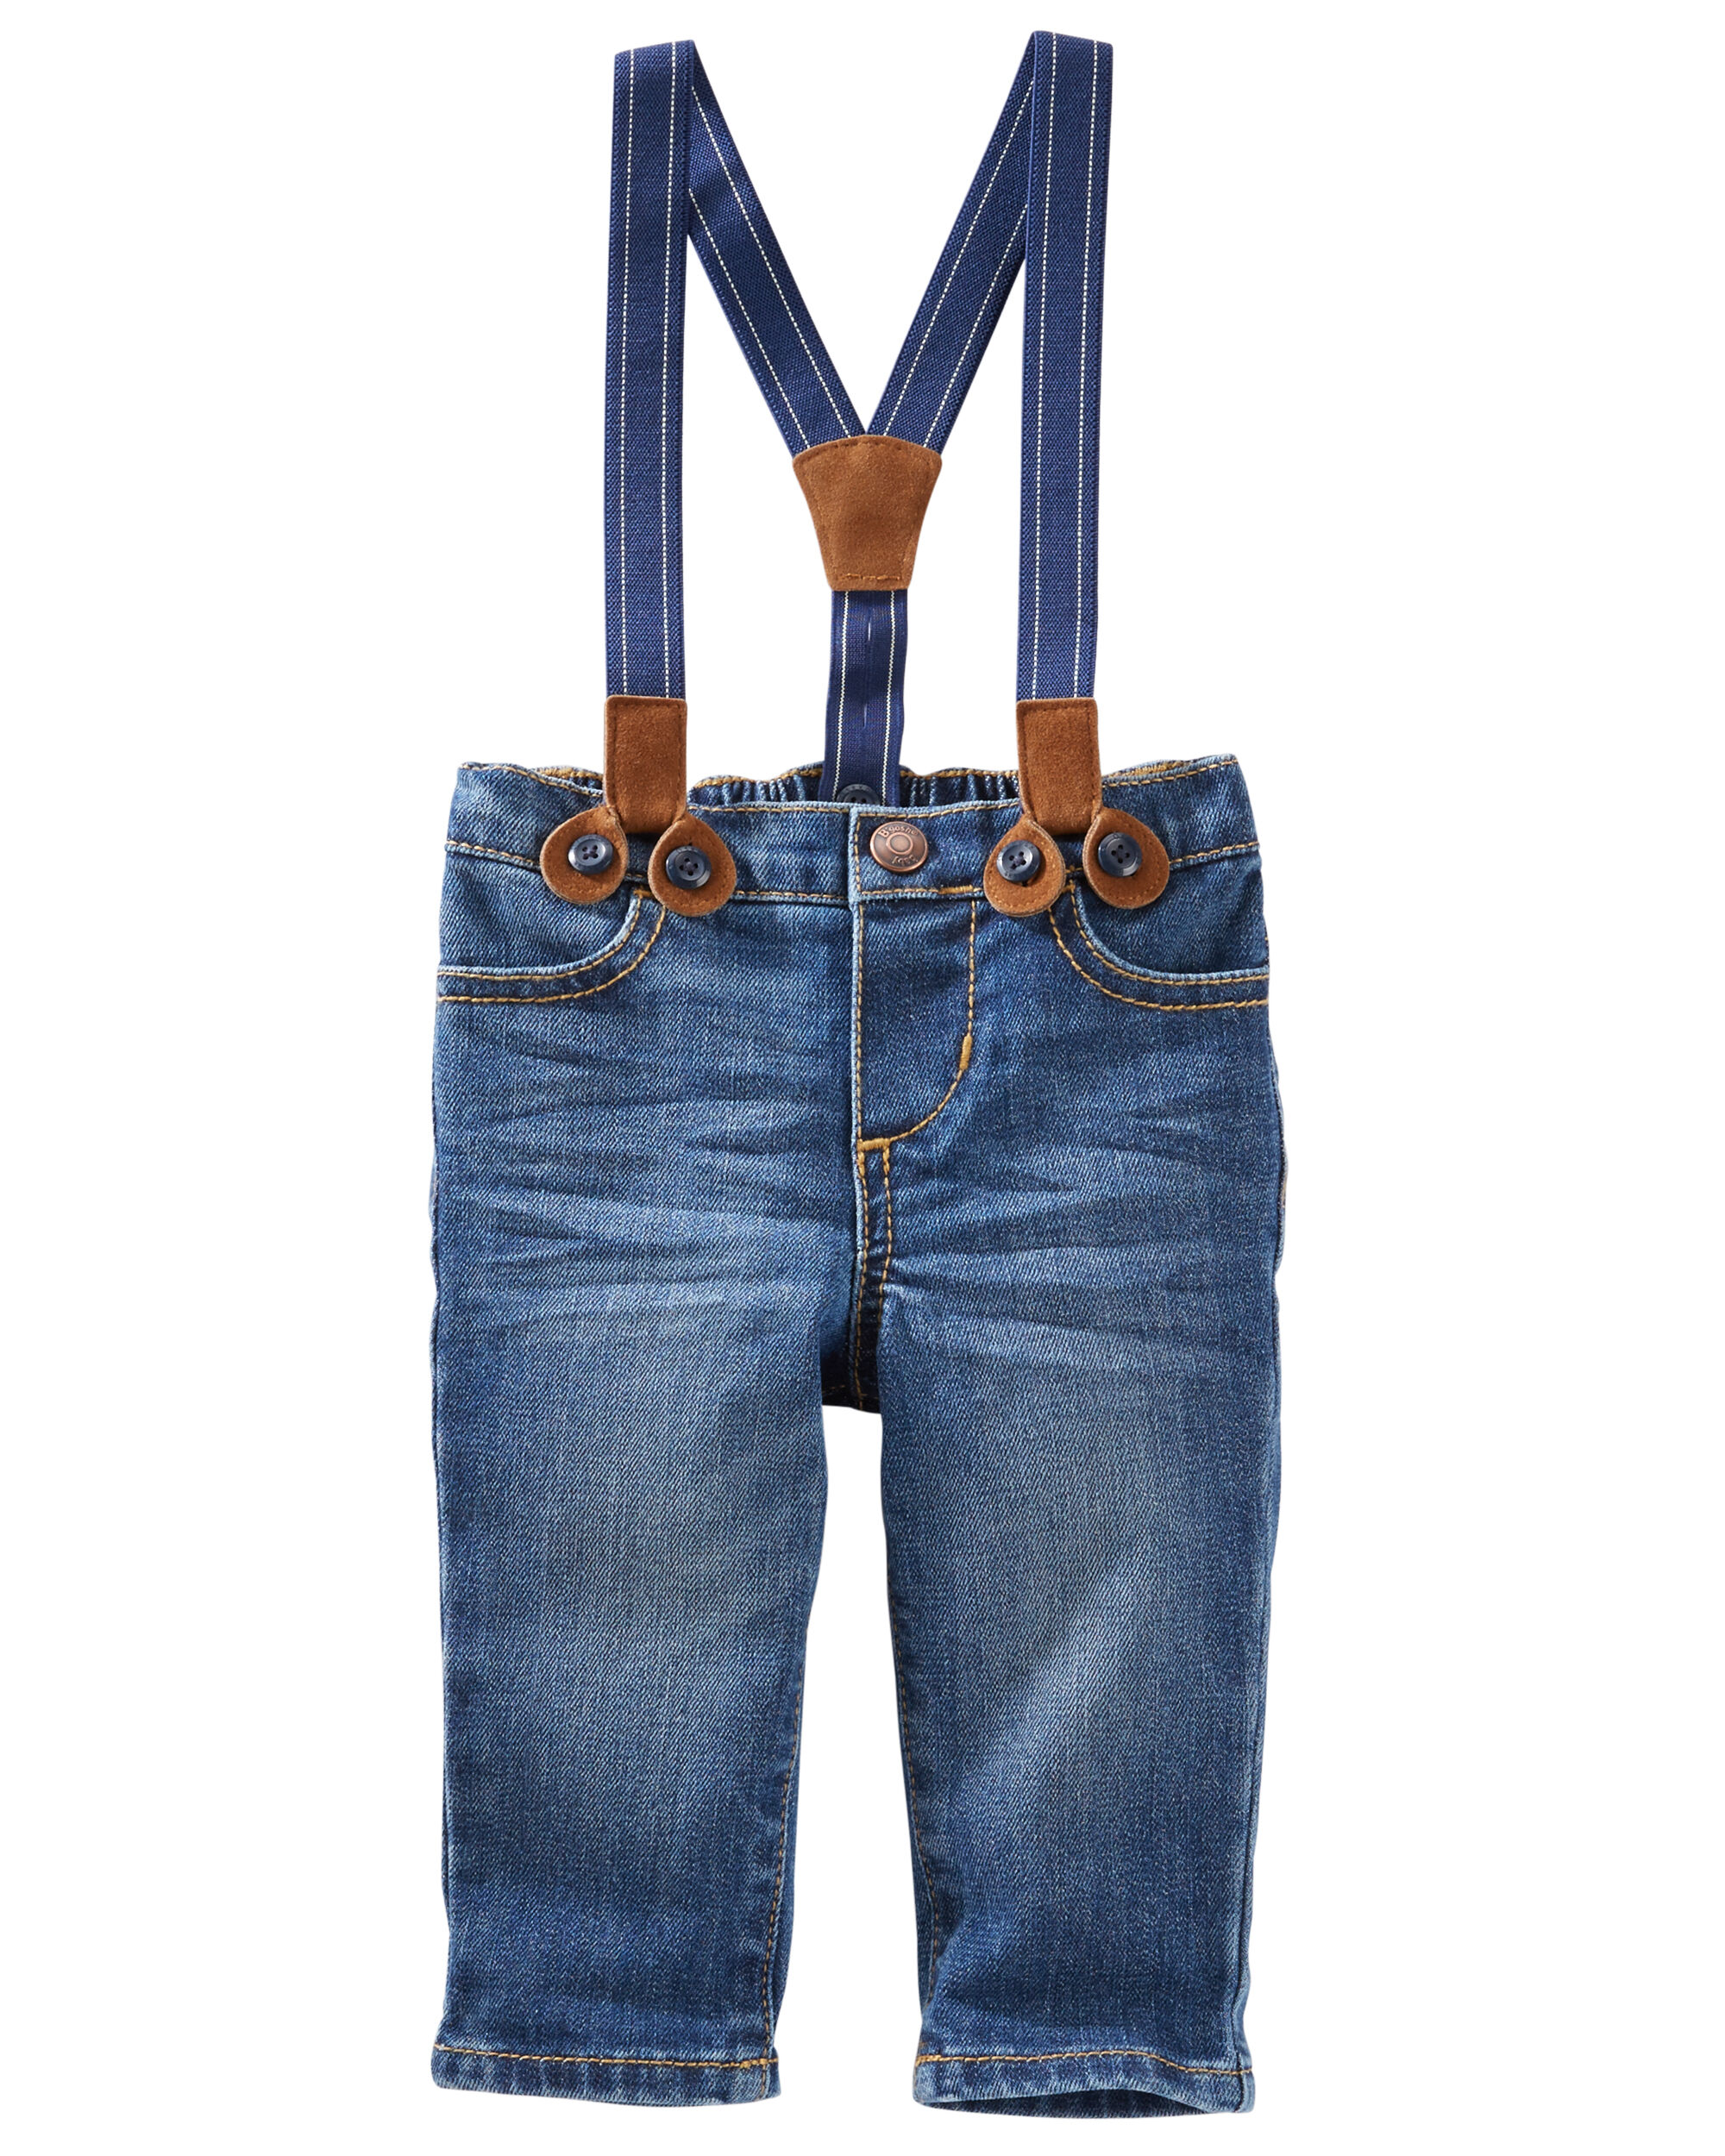 7c9ef8873 Suspender Jeans - Derby Wash   OshKosh.com